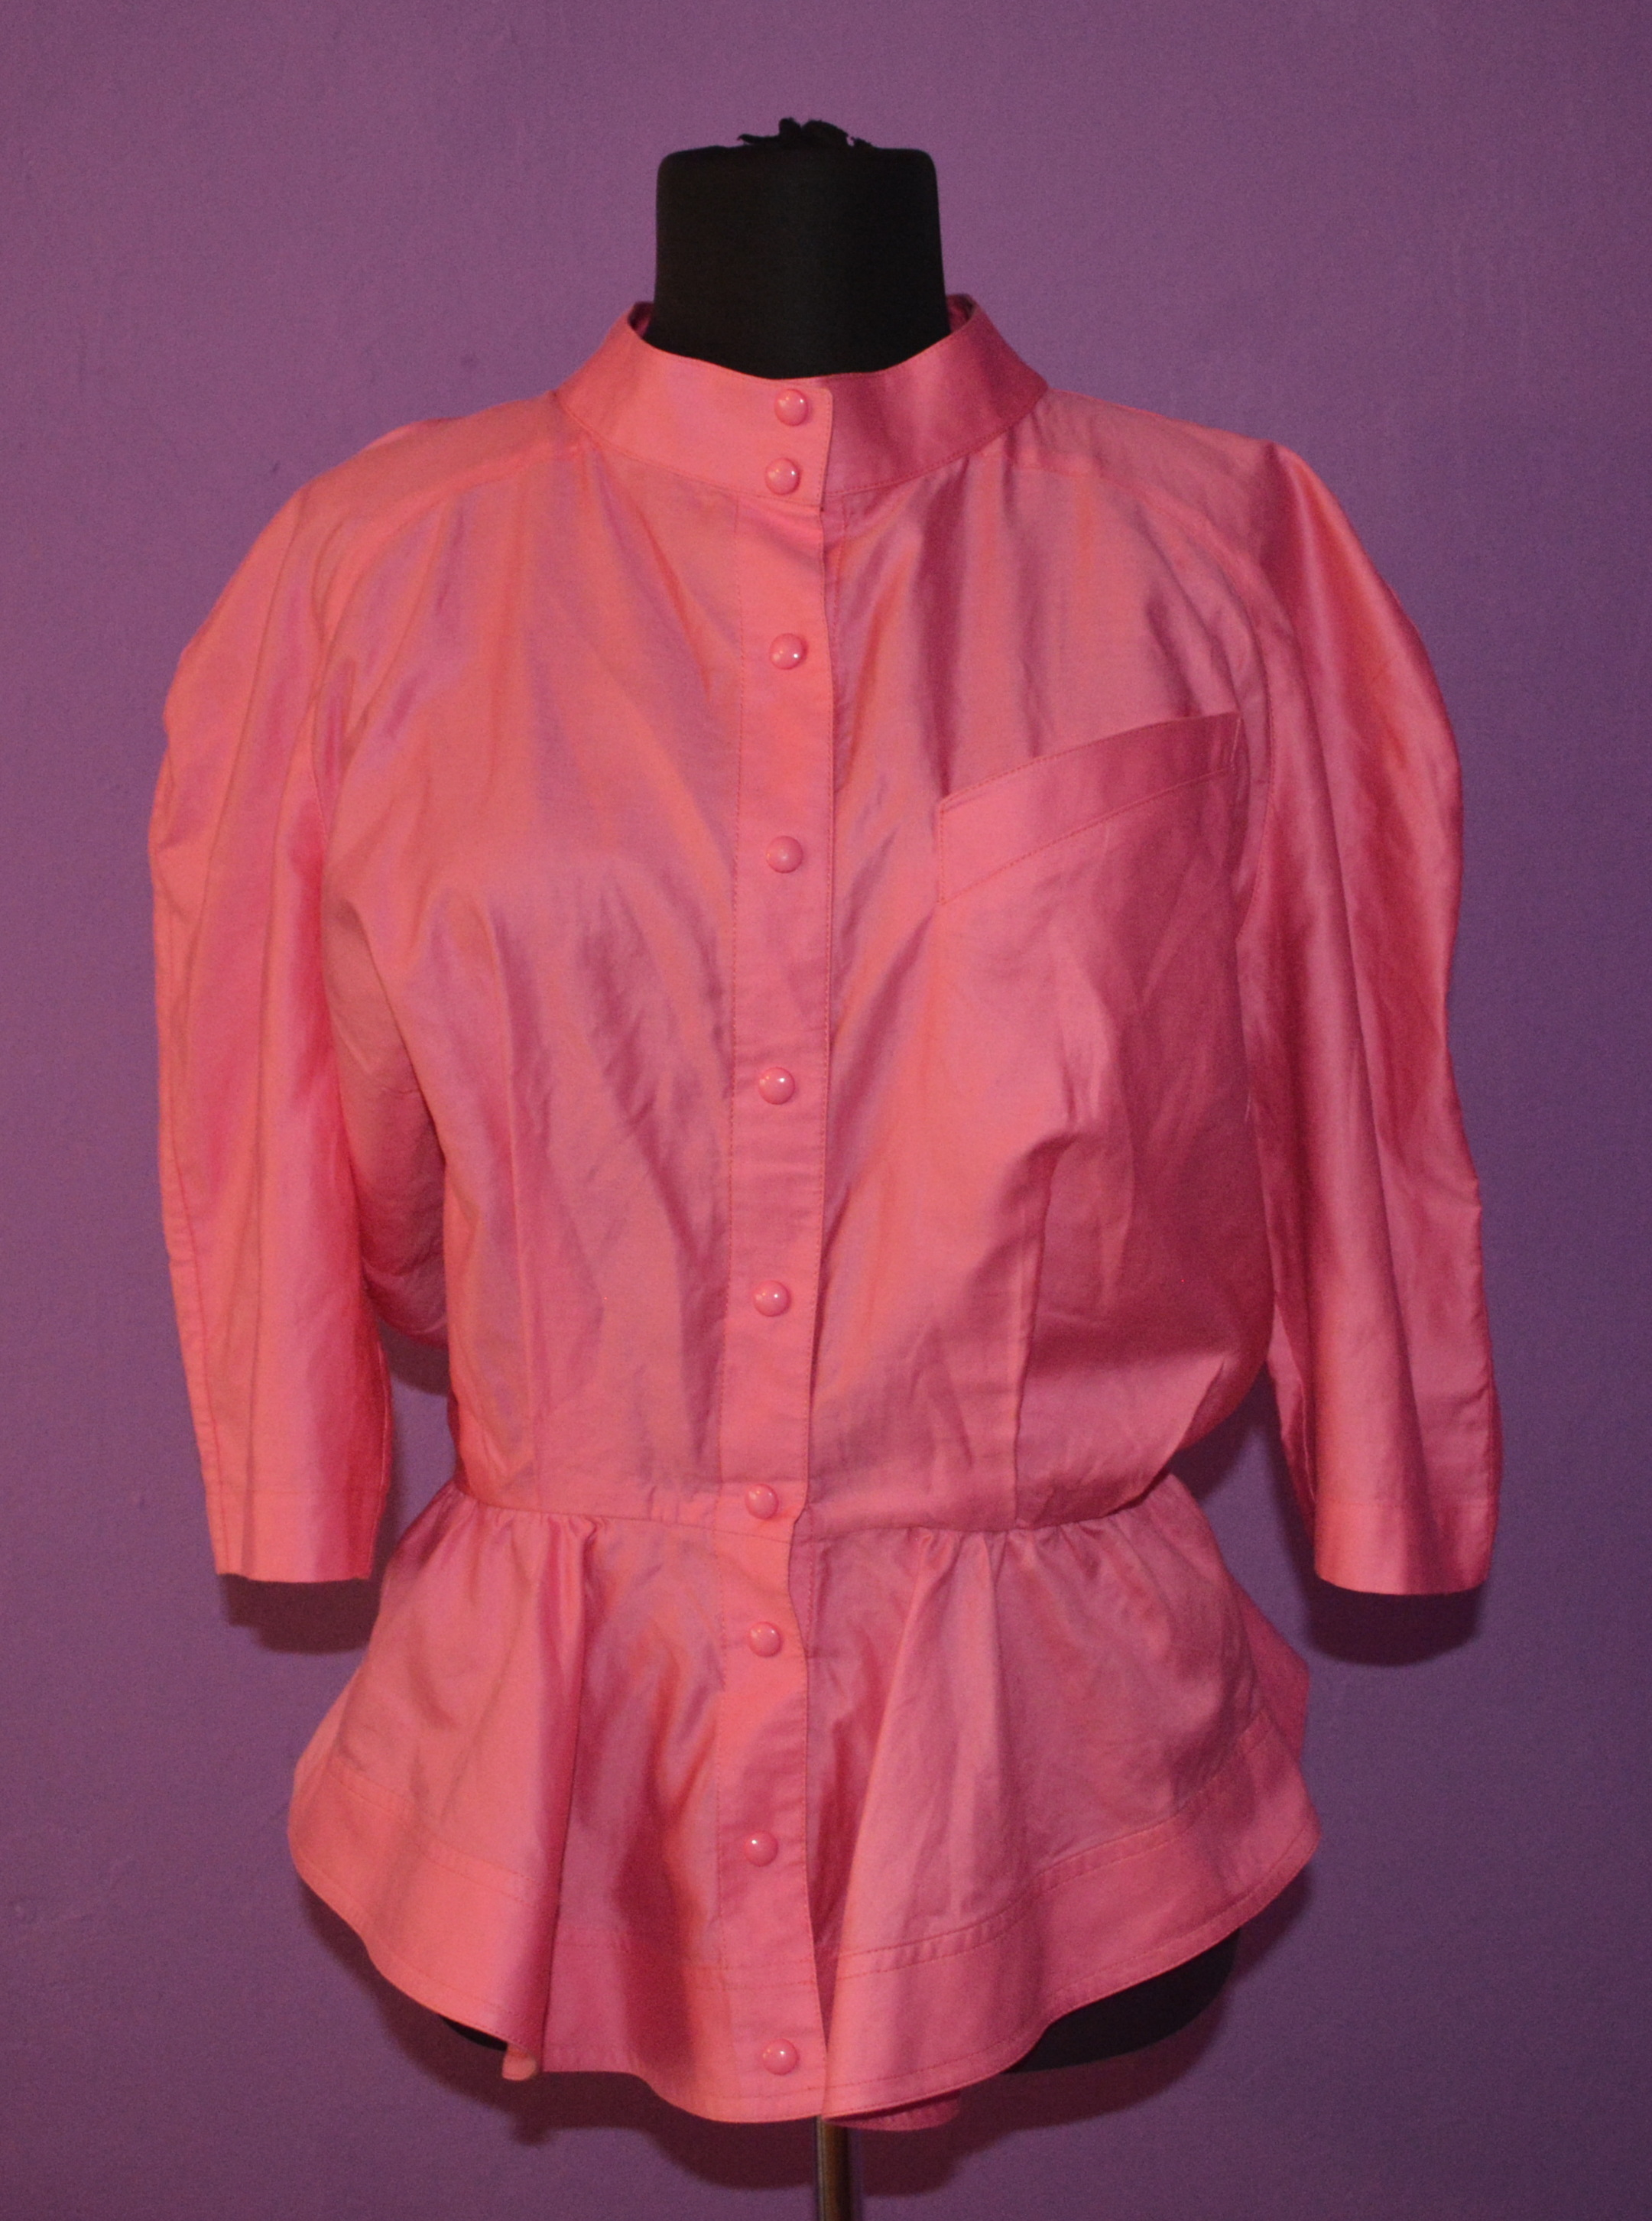 THIERRY MUGLER vintage womens vibrant pink blouse jacket sz M